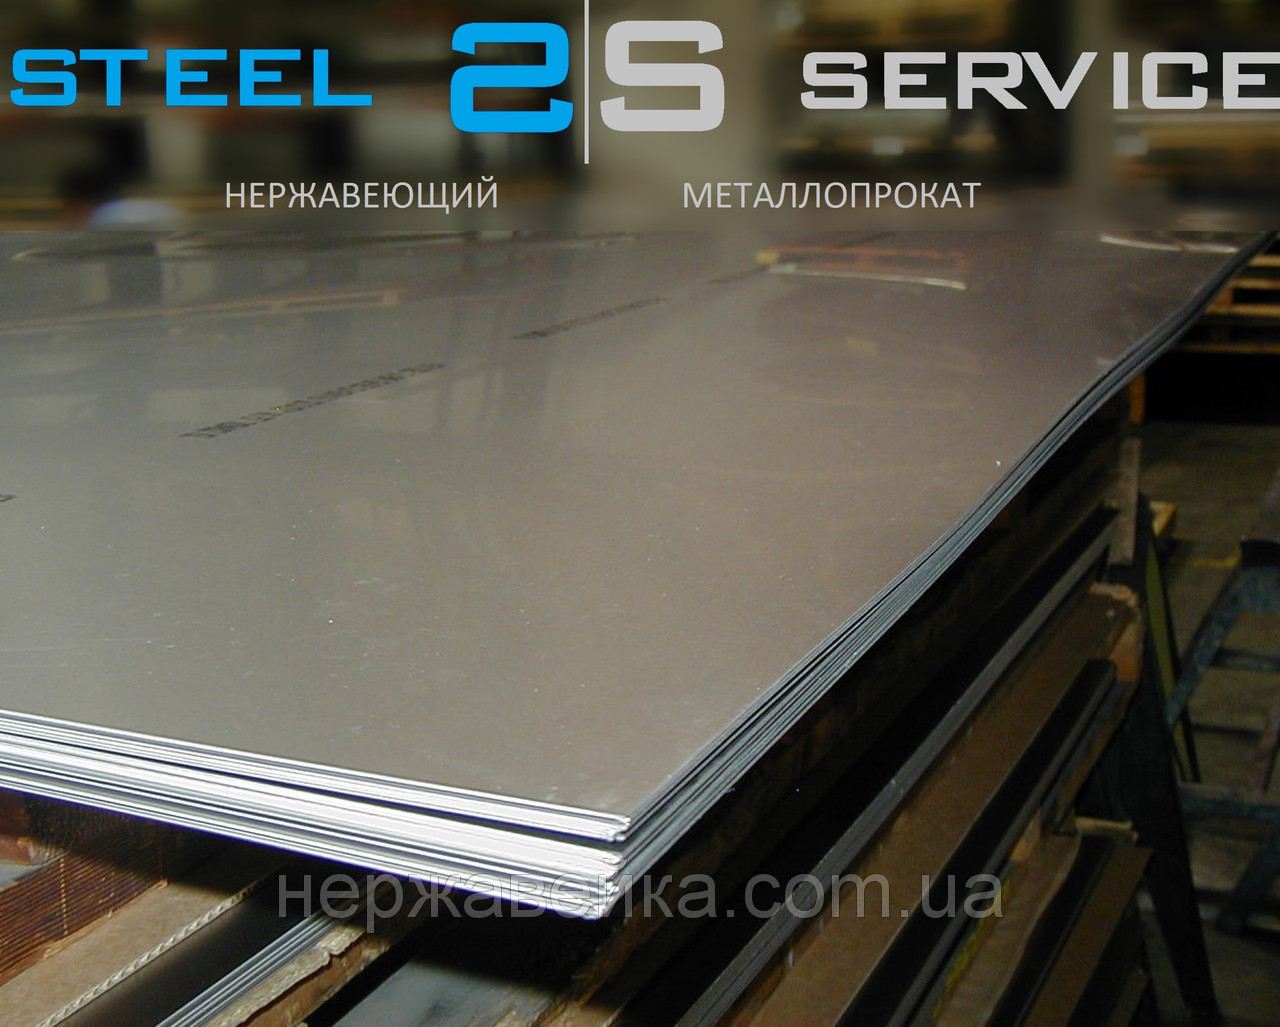 Нержавеющий лист 1,5х1000х2000мм  AISI 316Ti(10Х17Н13М2Т) 2B - матовый,  кислотостойкий